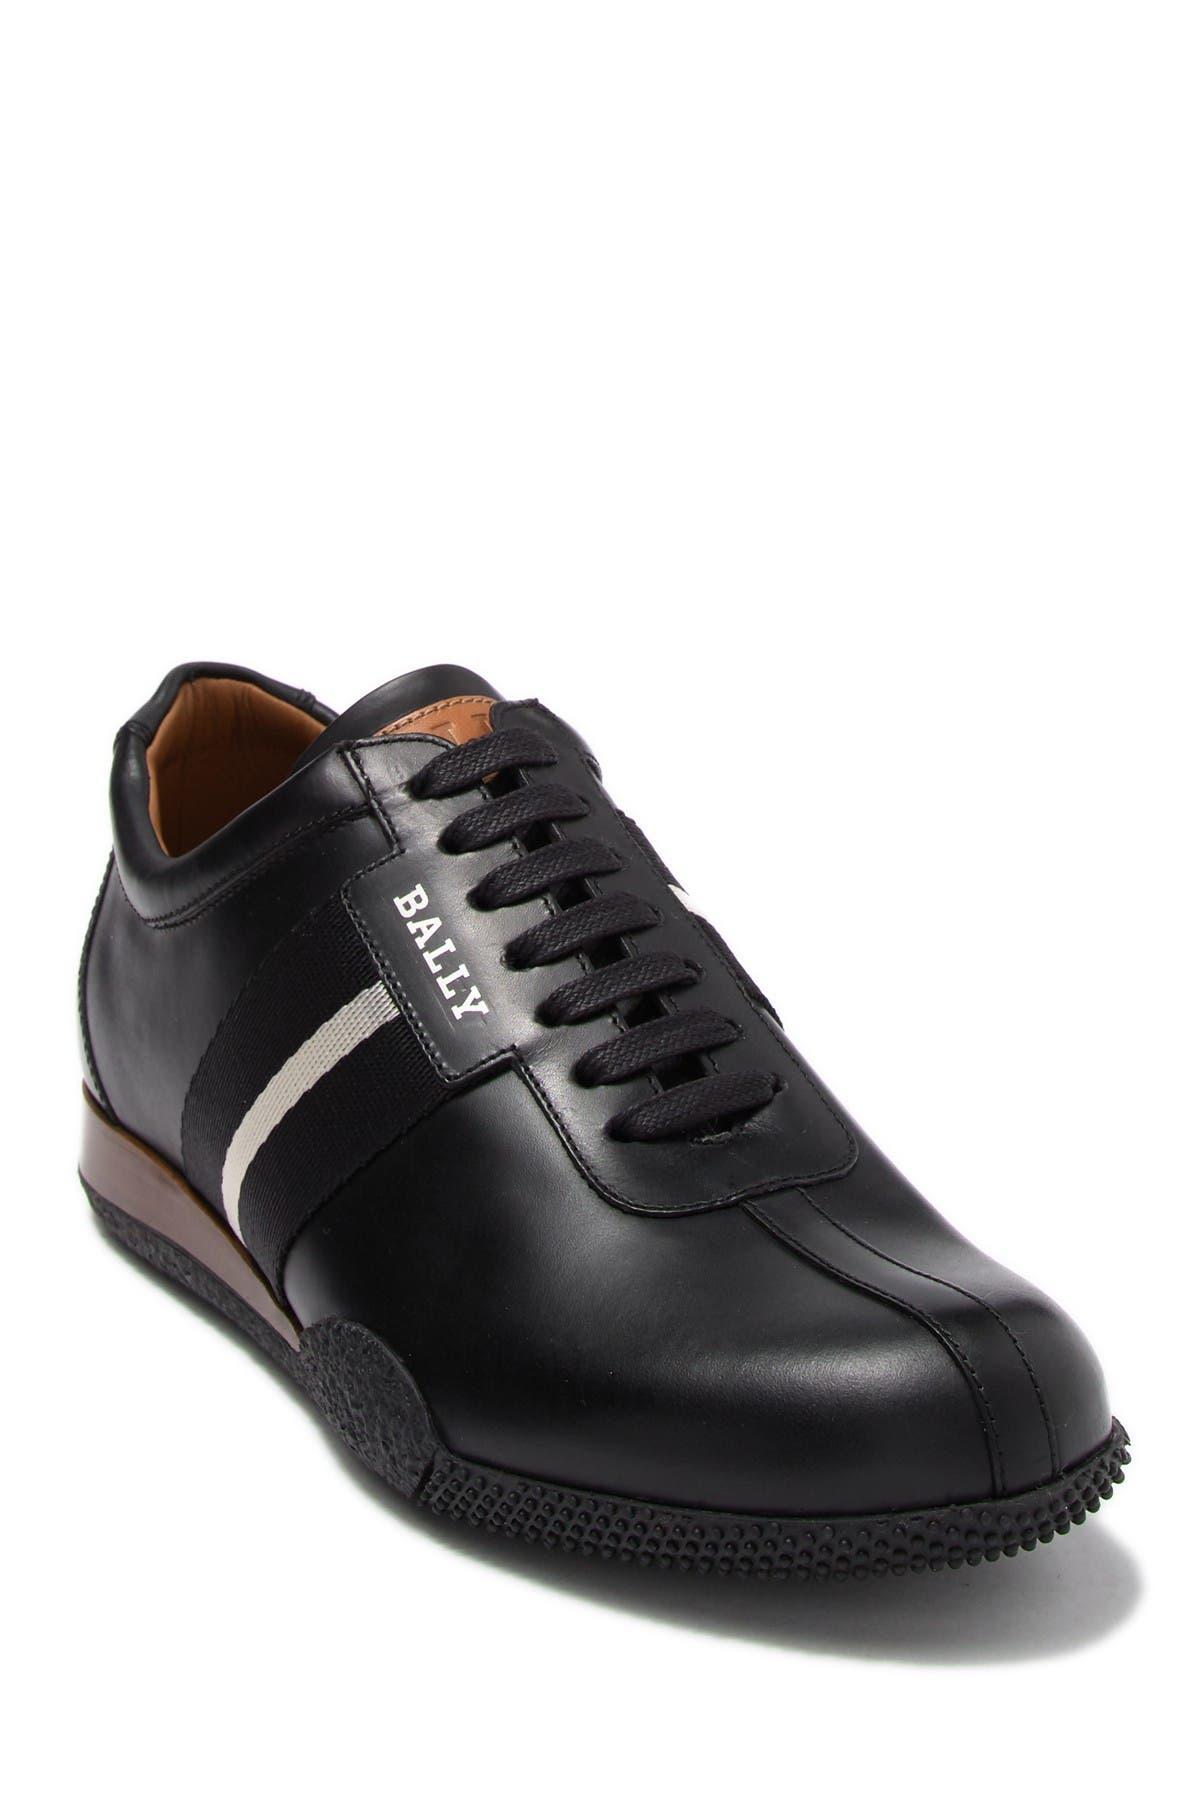 BALLY   Frenz Leather Sneaker